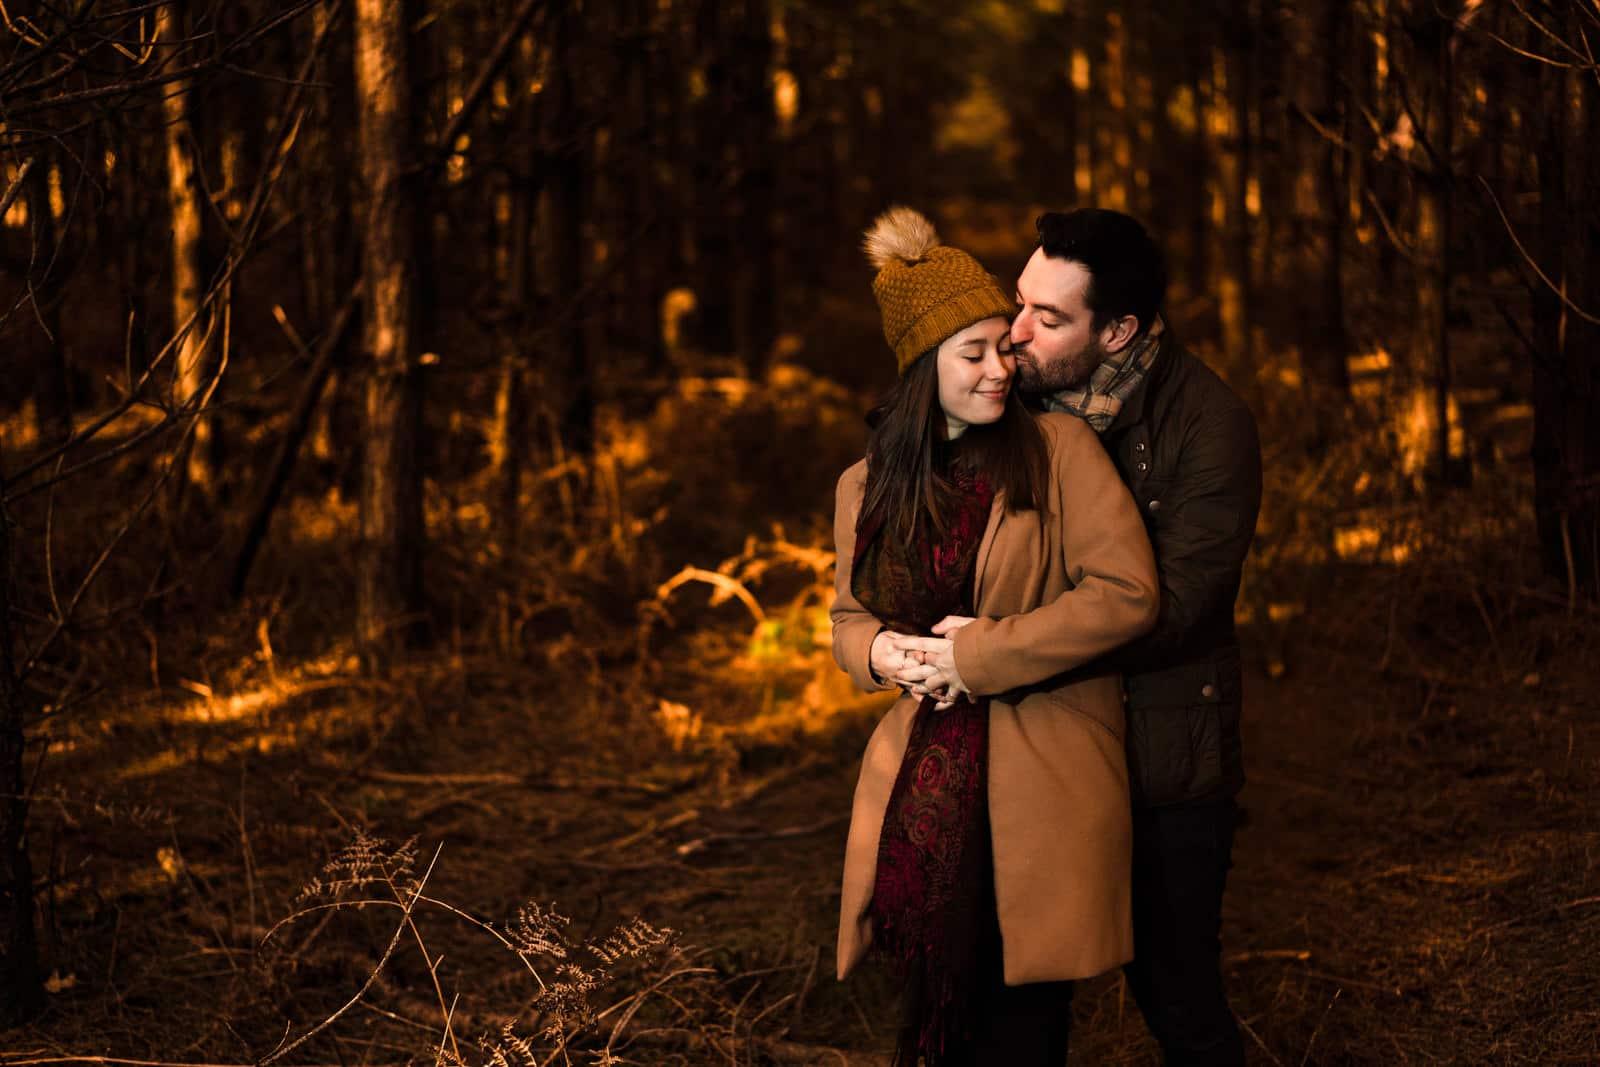 Tree walk backdrop at harlestone firs, couple embracing